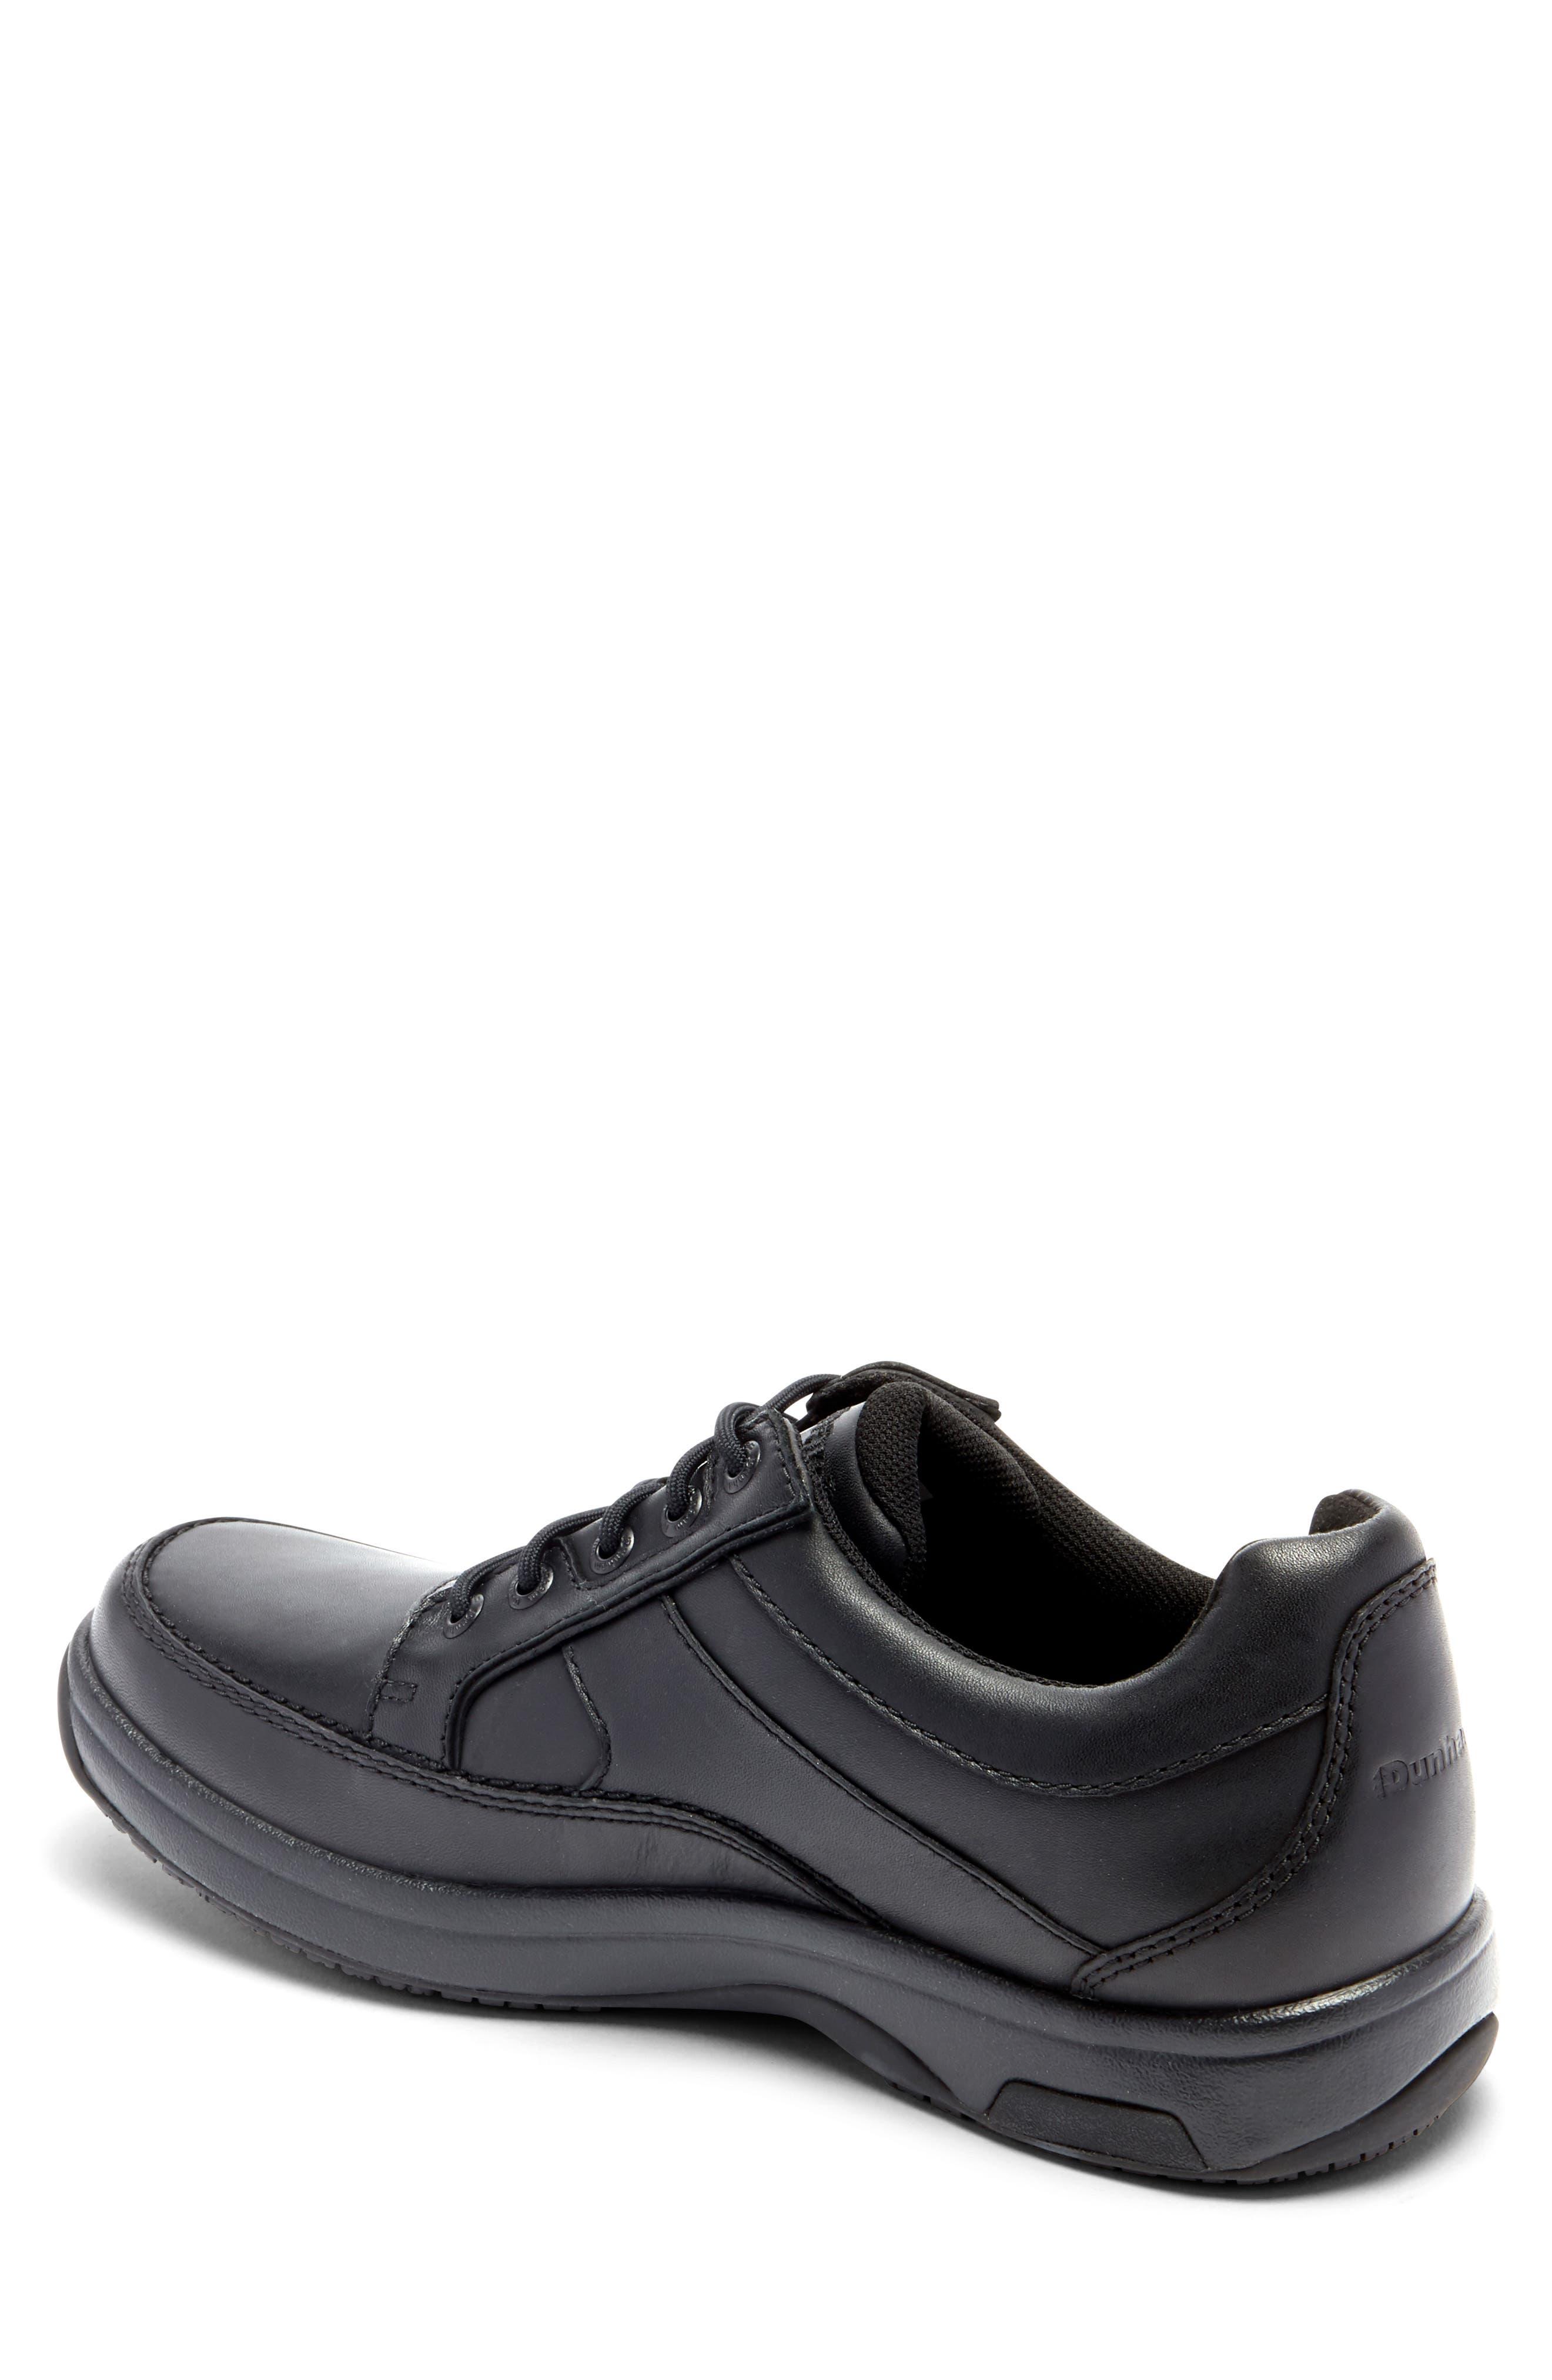 DUNHAM, 'Midland' Sneaker, Alternate thumbnail 2, color, BLACK LEATHER